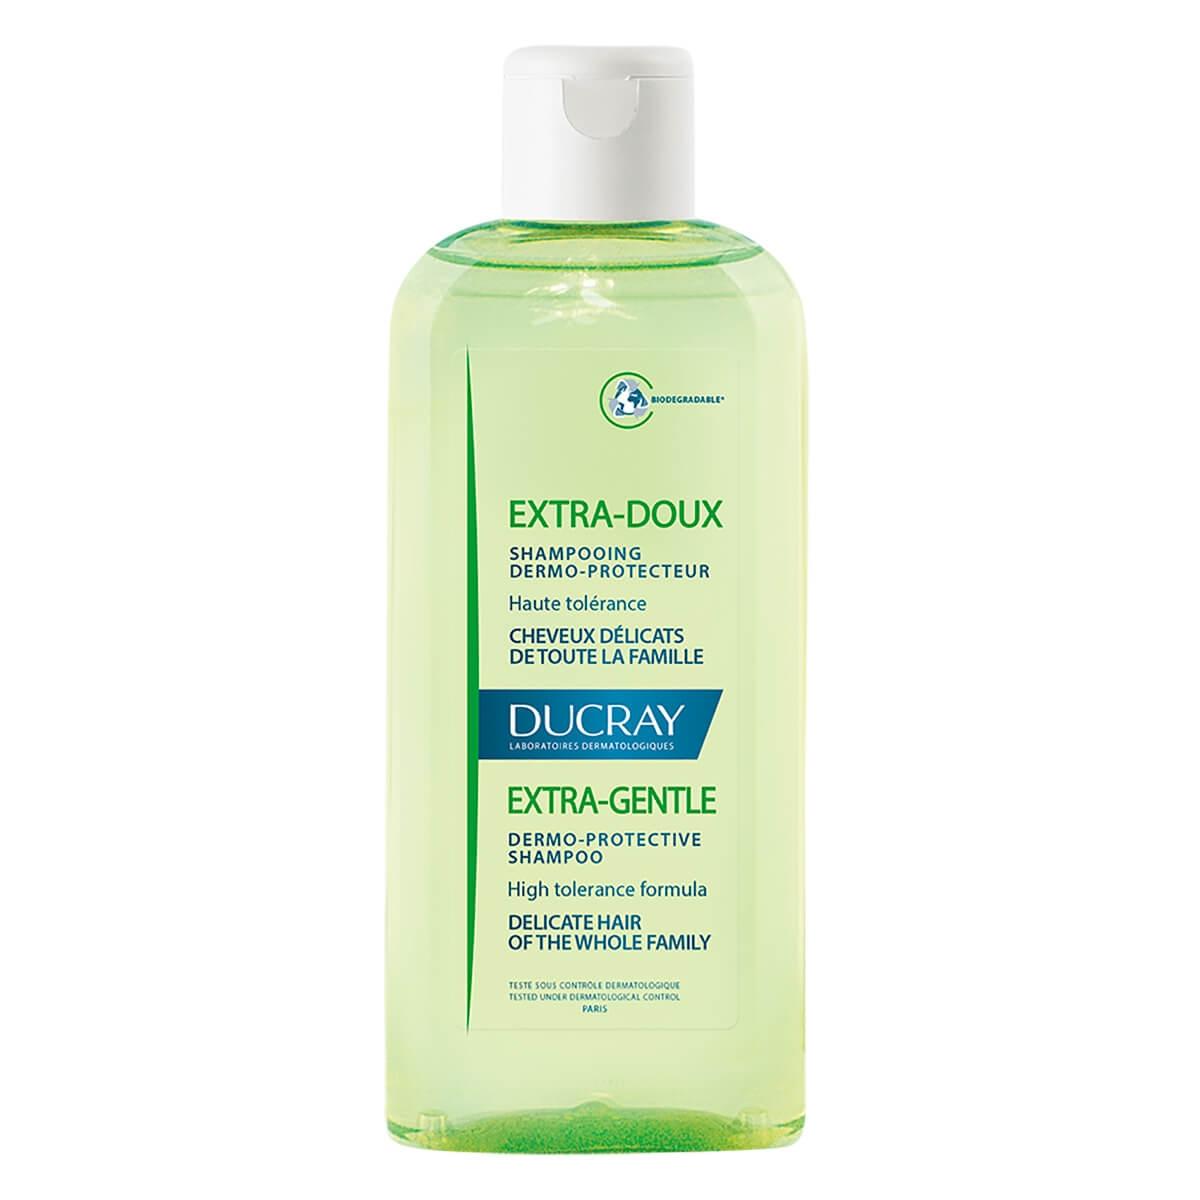 Shampoo Ducray Extra-Doux Dermoprotetor com 200ml 200ml